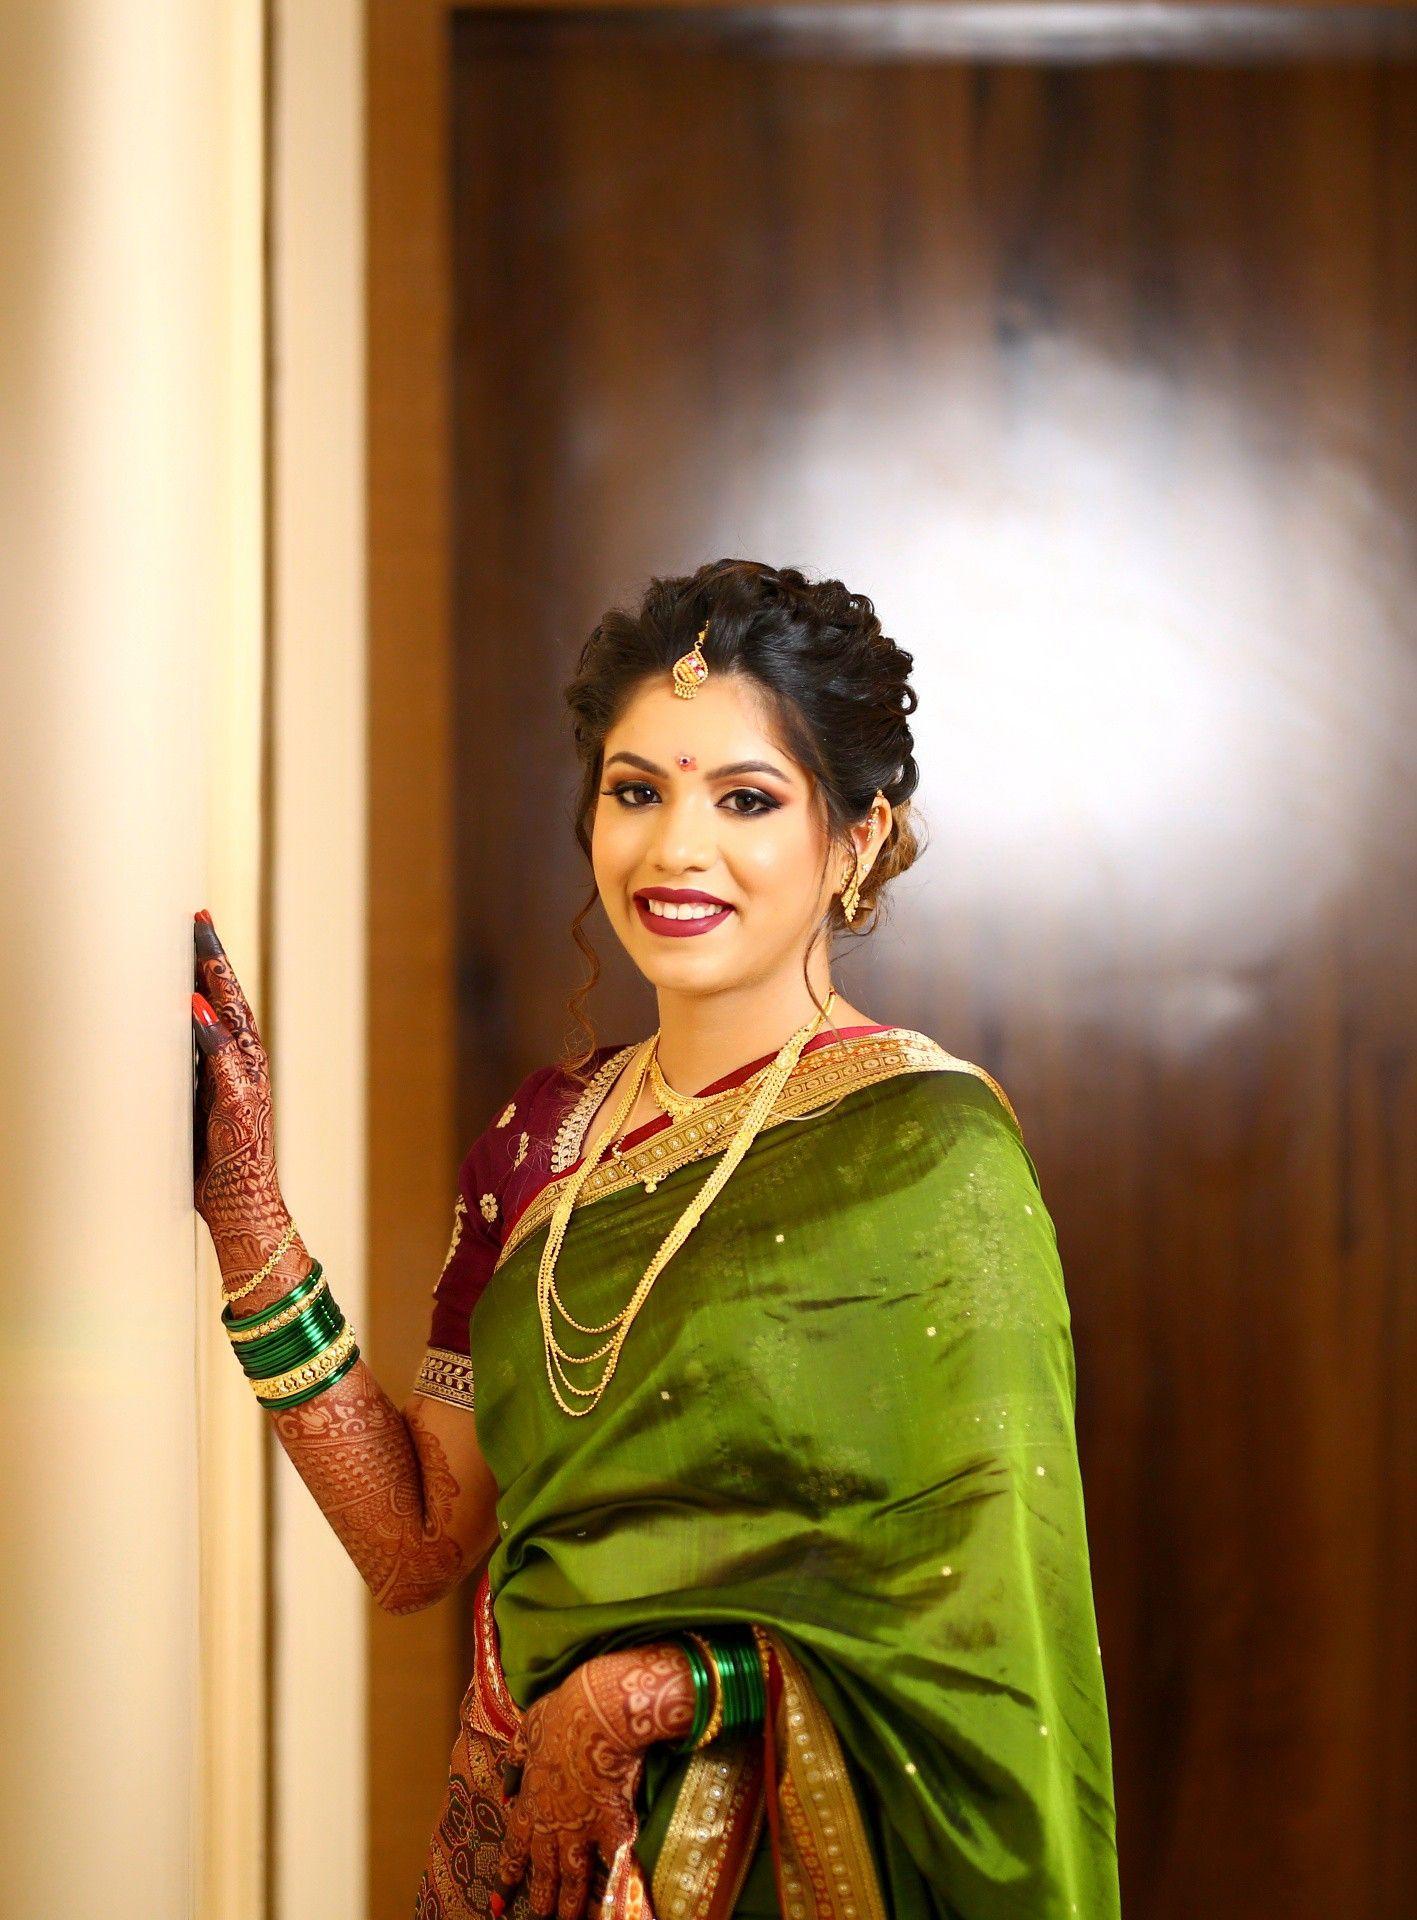 maharashtrian bridal makeup | maharashtrian bride in 2019